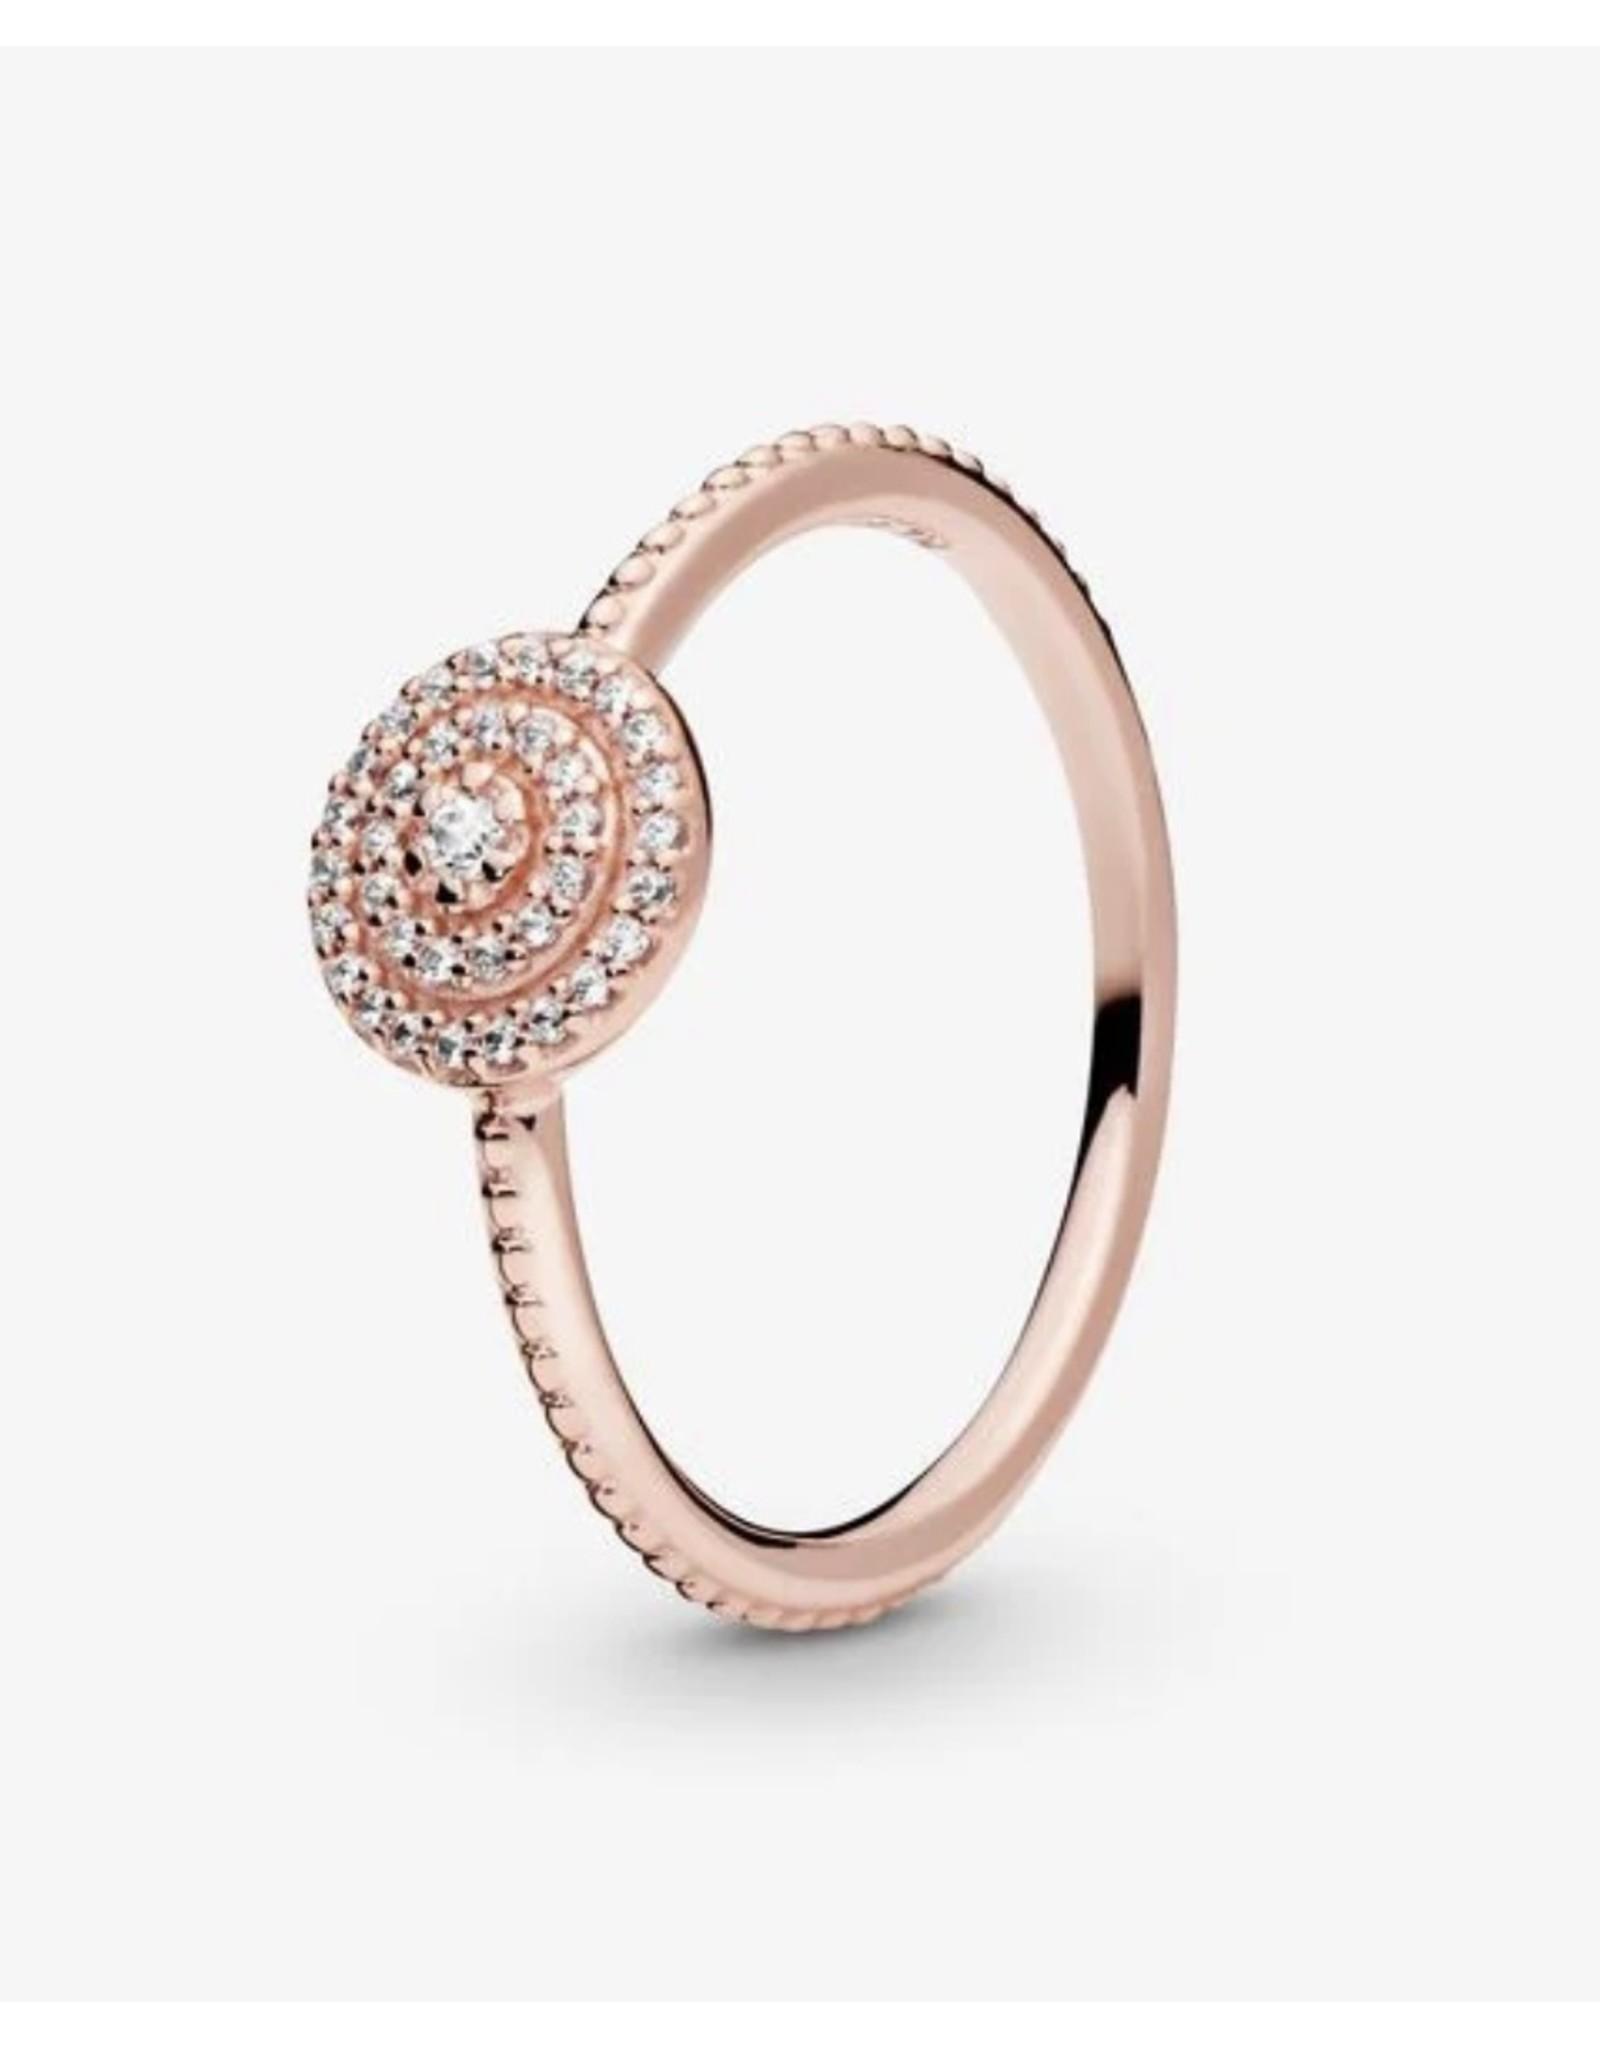 Pandora Pandora Ring,( 180986CZ) Rose Gold, Radiant Elegance, Clear CZ